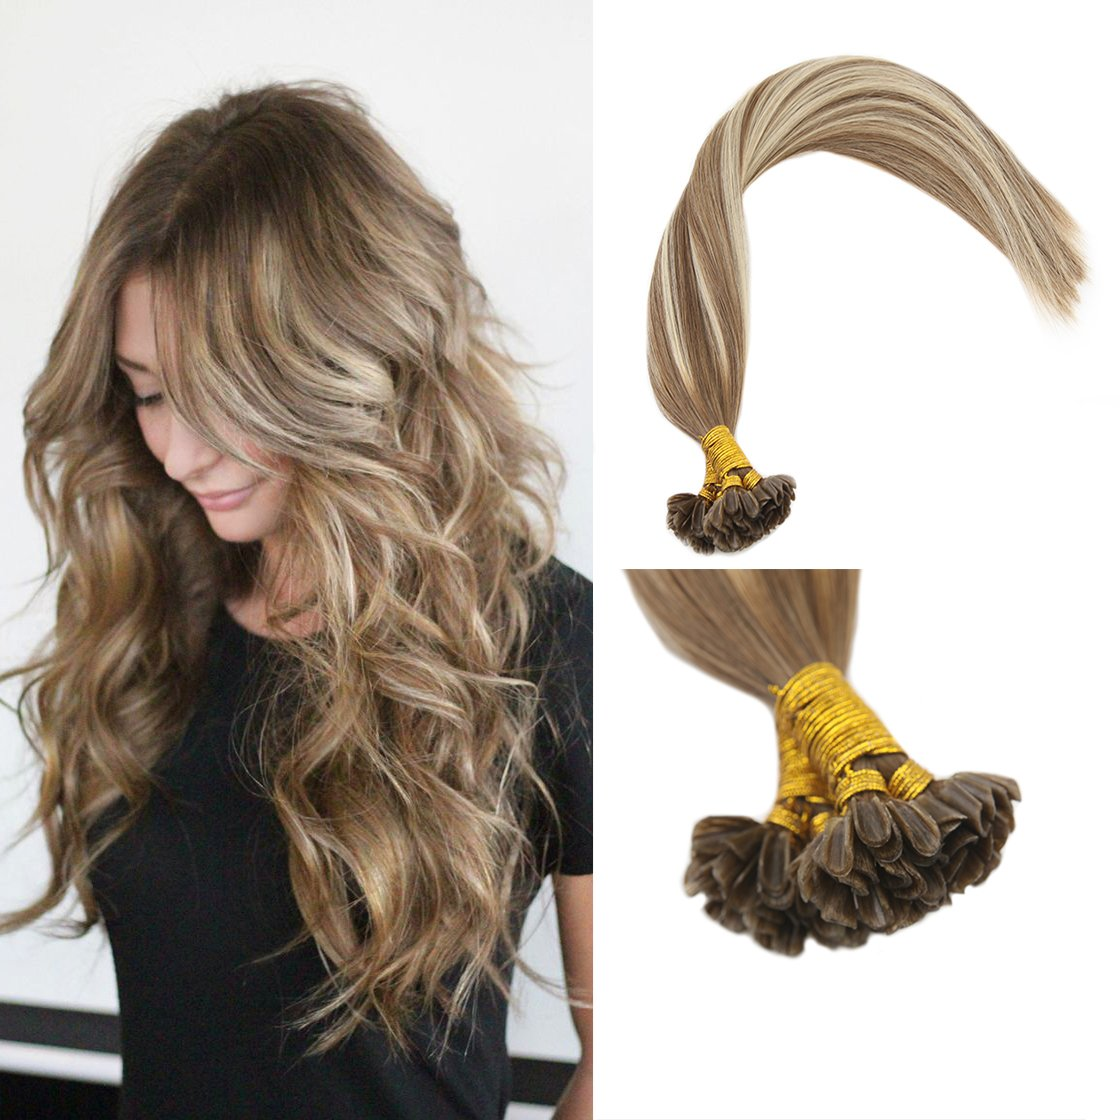 Amazon Sunny 16 Pre Bonded Human Hair Extensions Balayage